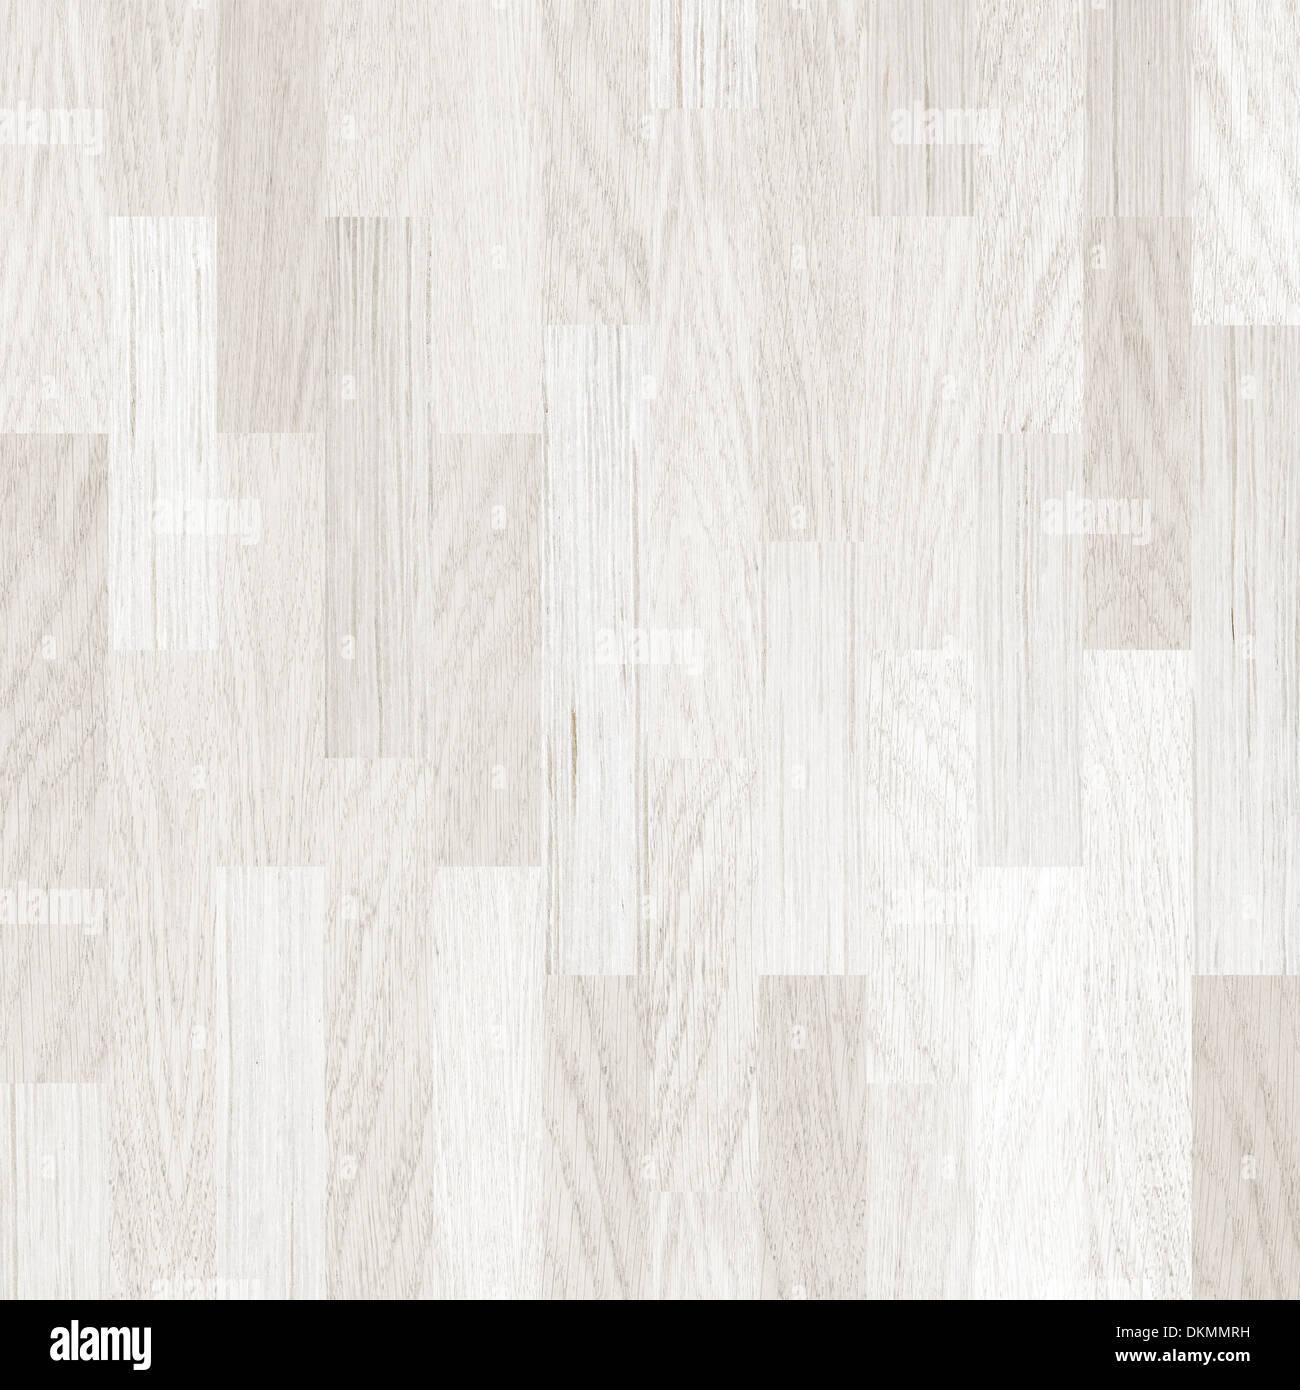 wooden floor white parquet background - Stock Image